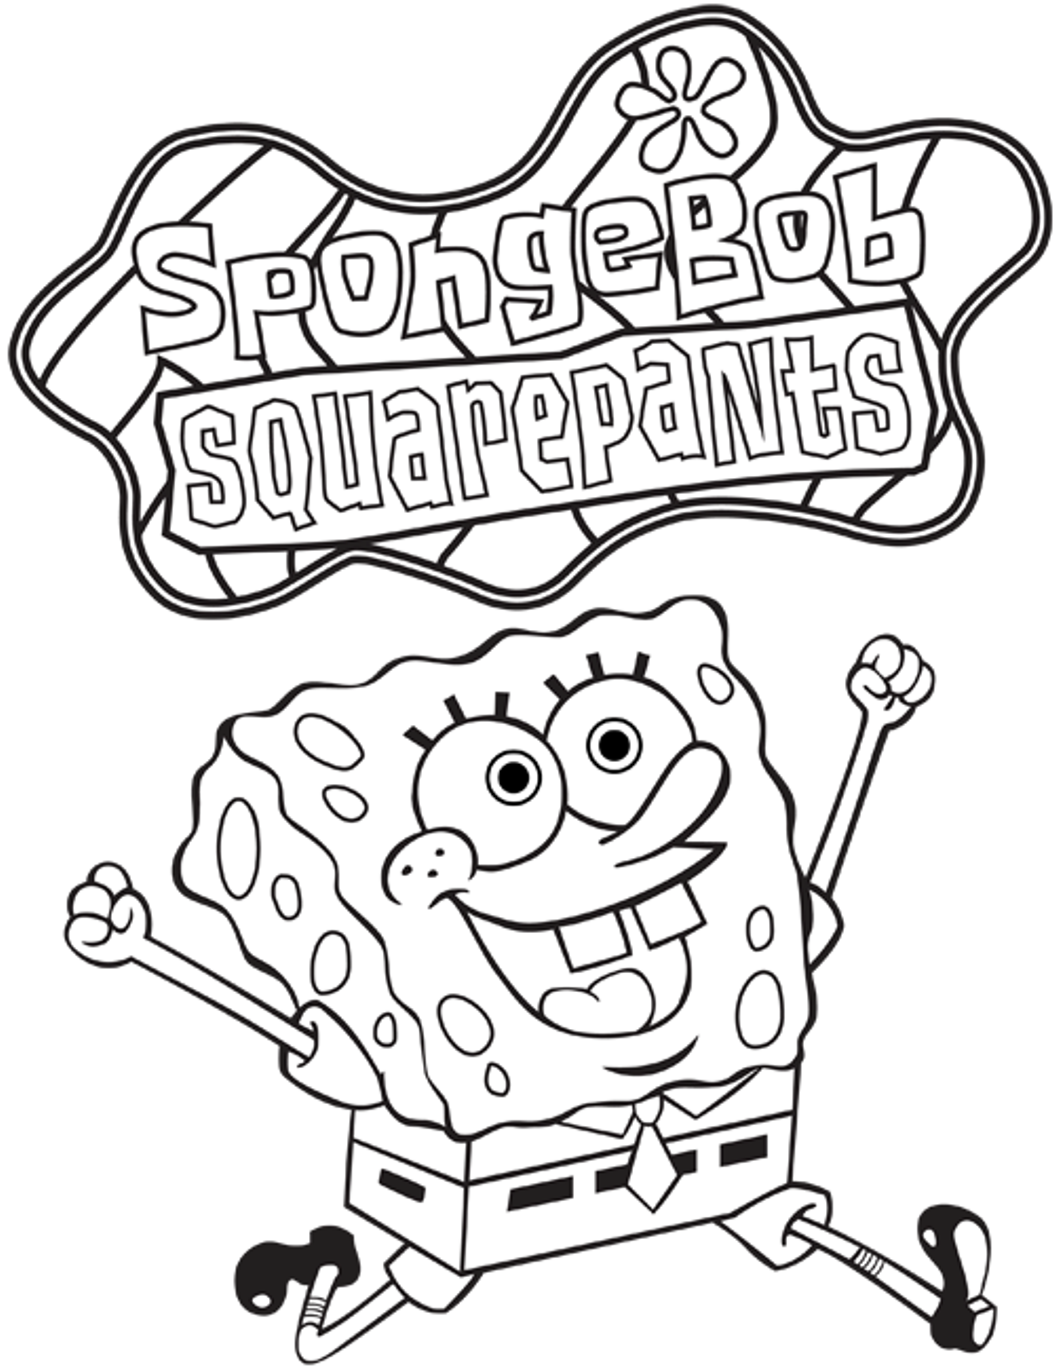 Coloring pages spongebob squarepants printable cartoon coloring